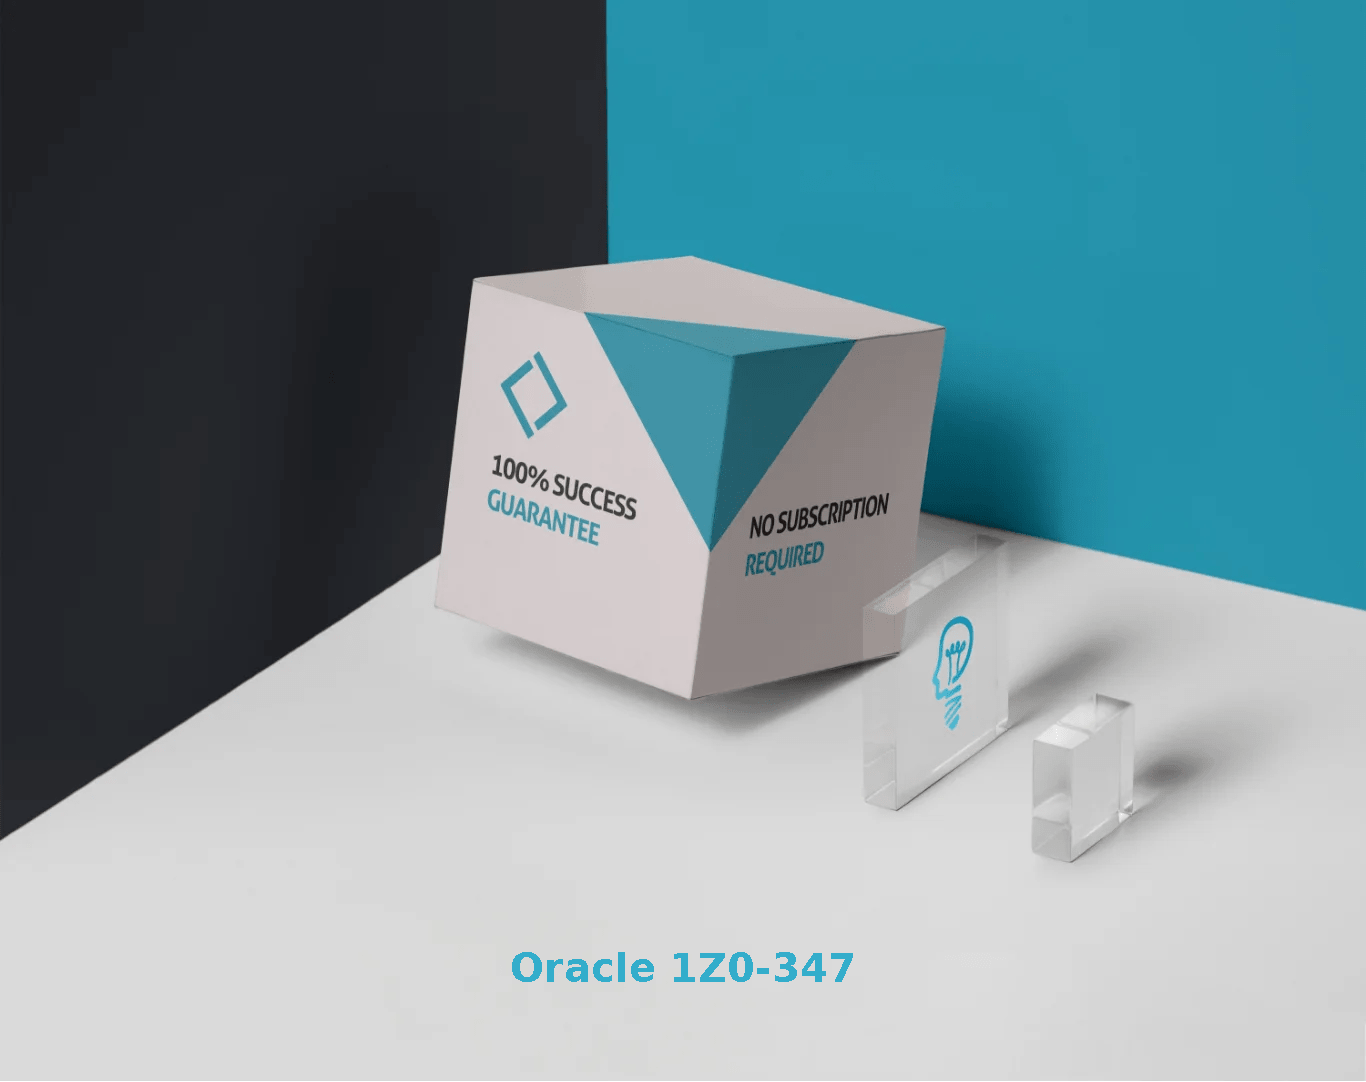 Oracle 1Z0-347 Exams